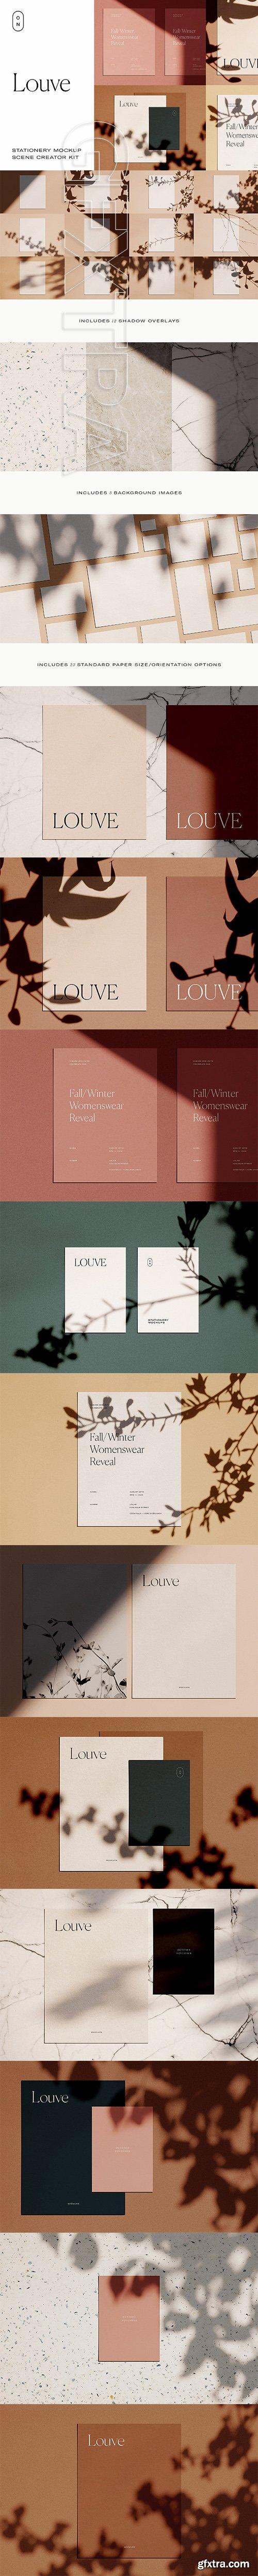 CreativeMarket - Louve – (Mockup Kit) Scene Creator 2845996